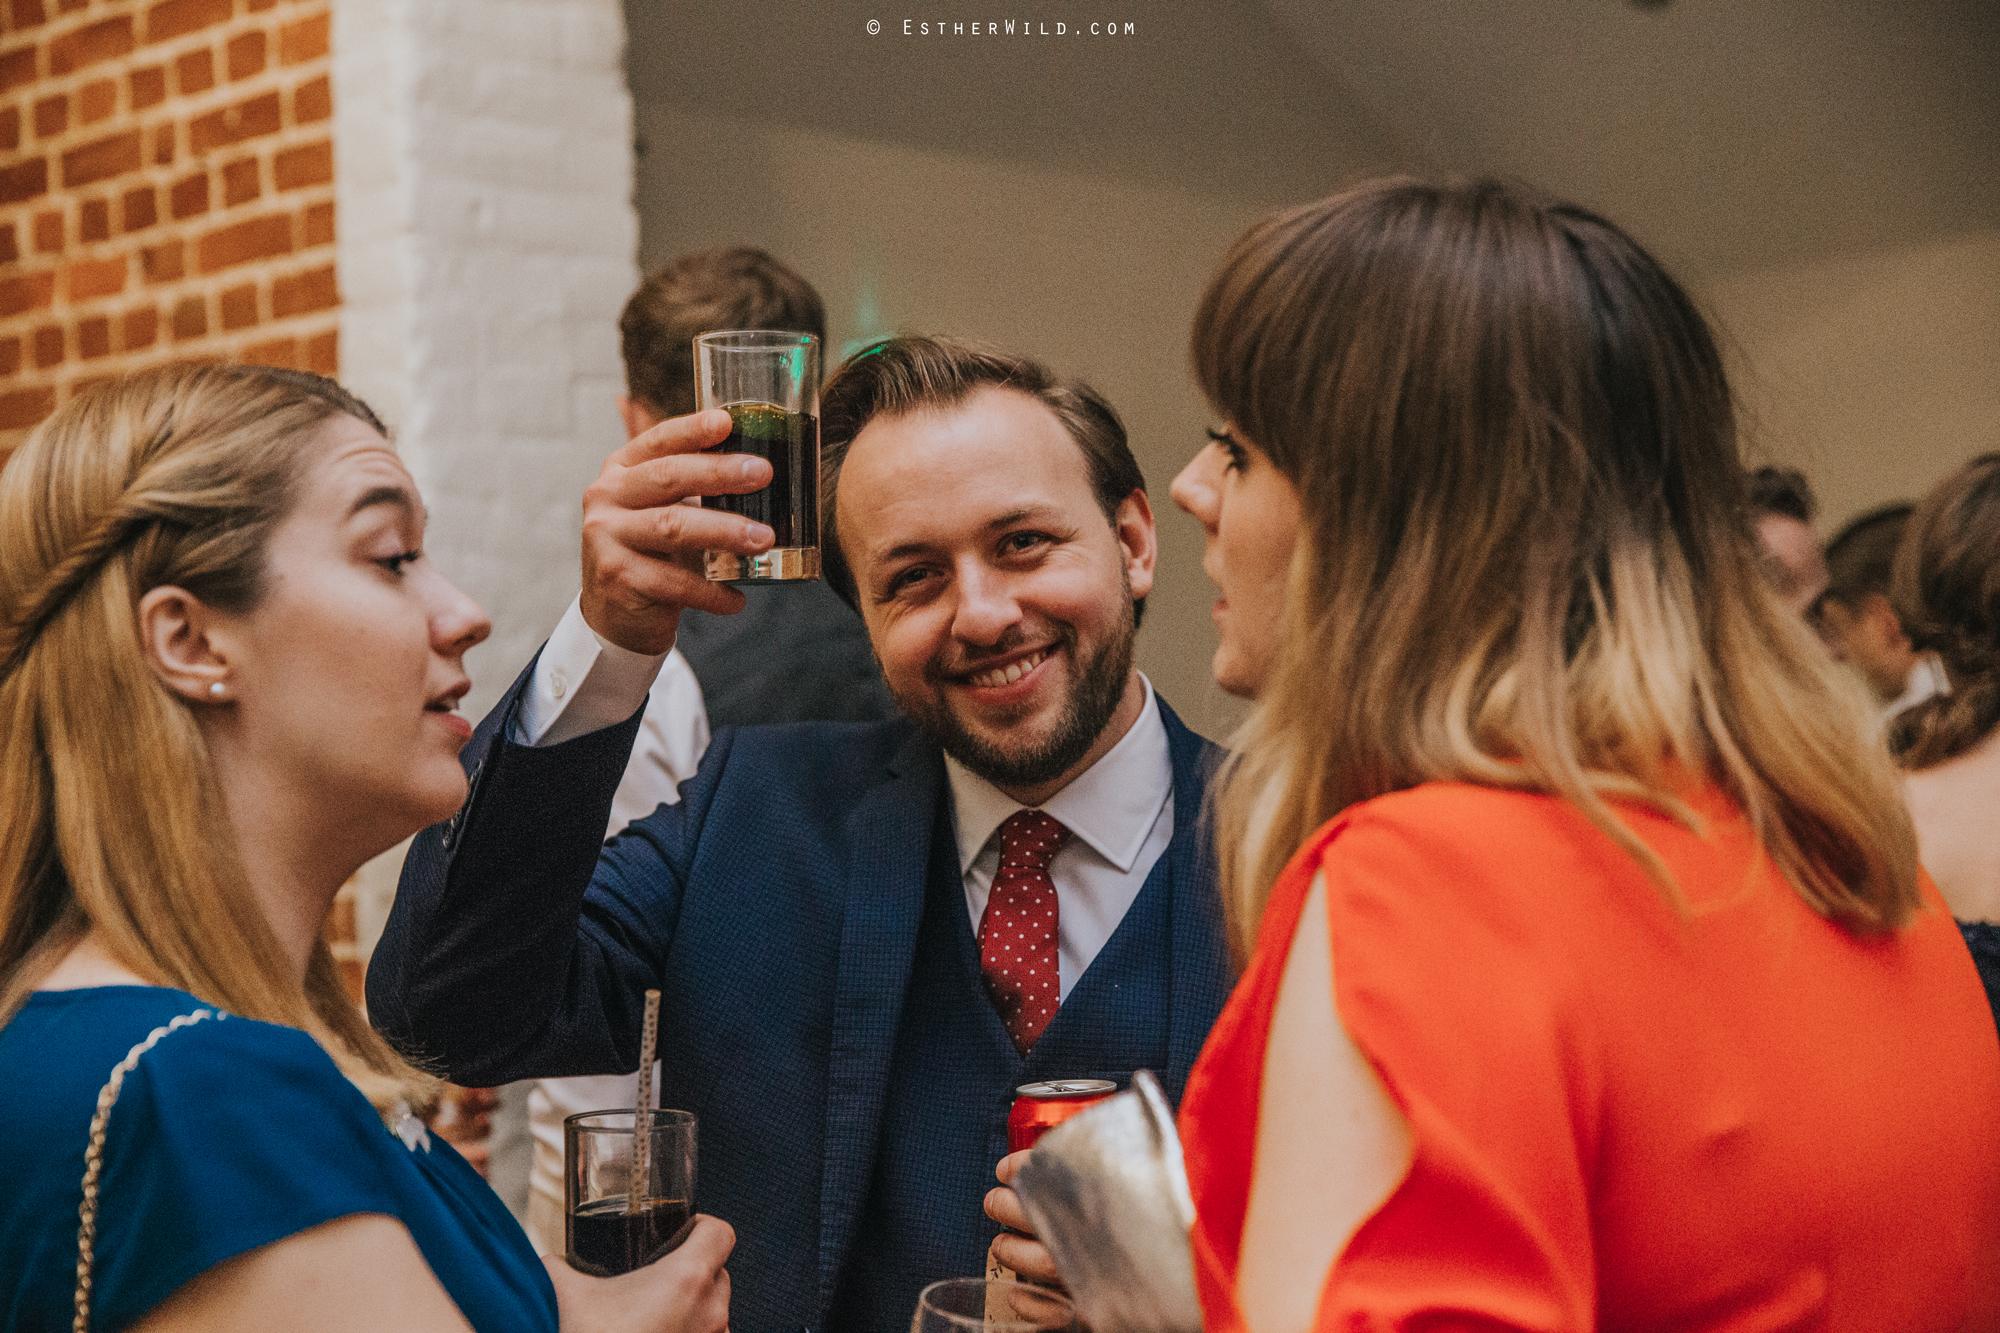 Reading_Room_Weddings_Alby_Norwich_Photographer_Esther_Wild_IMG_3672.jpg